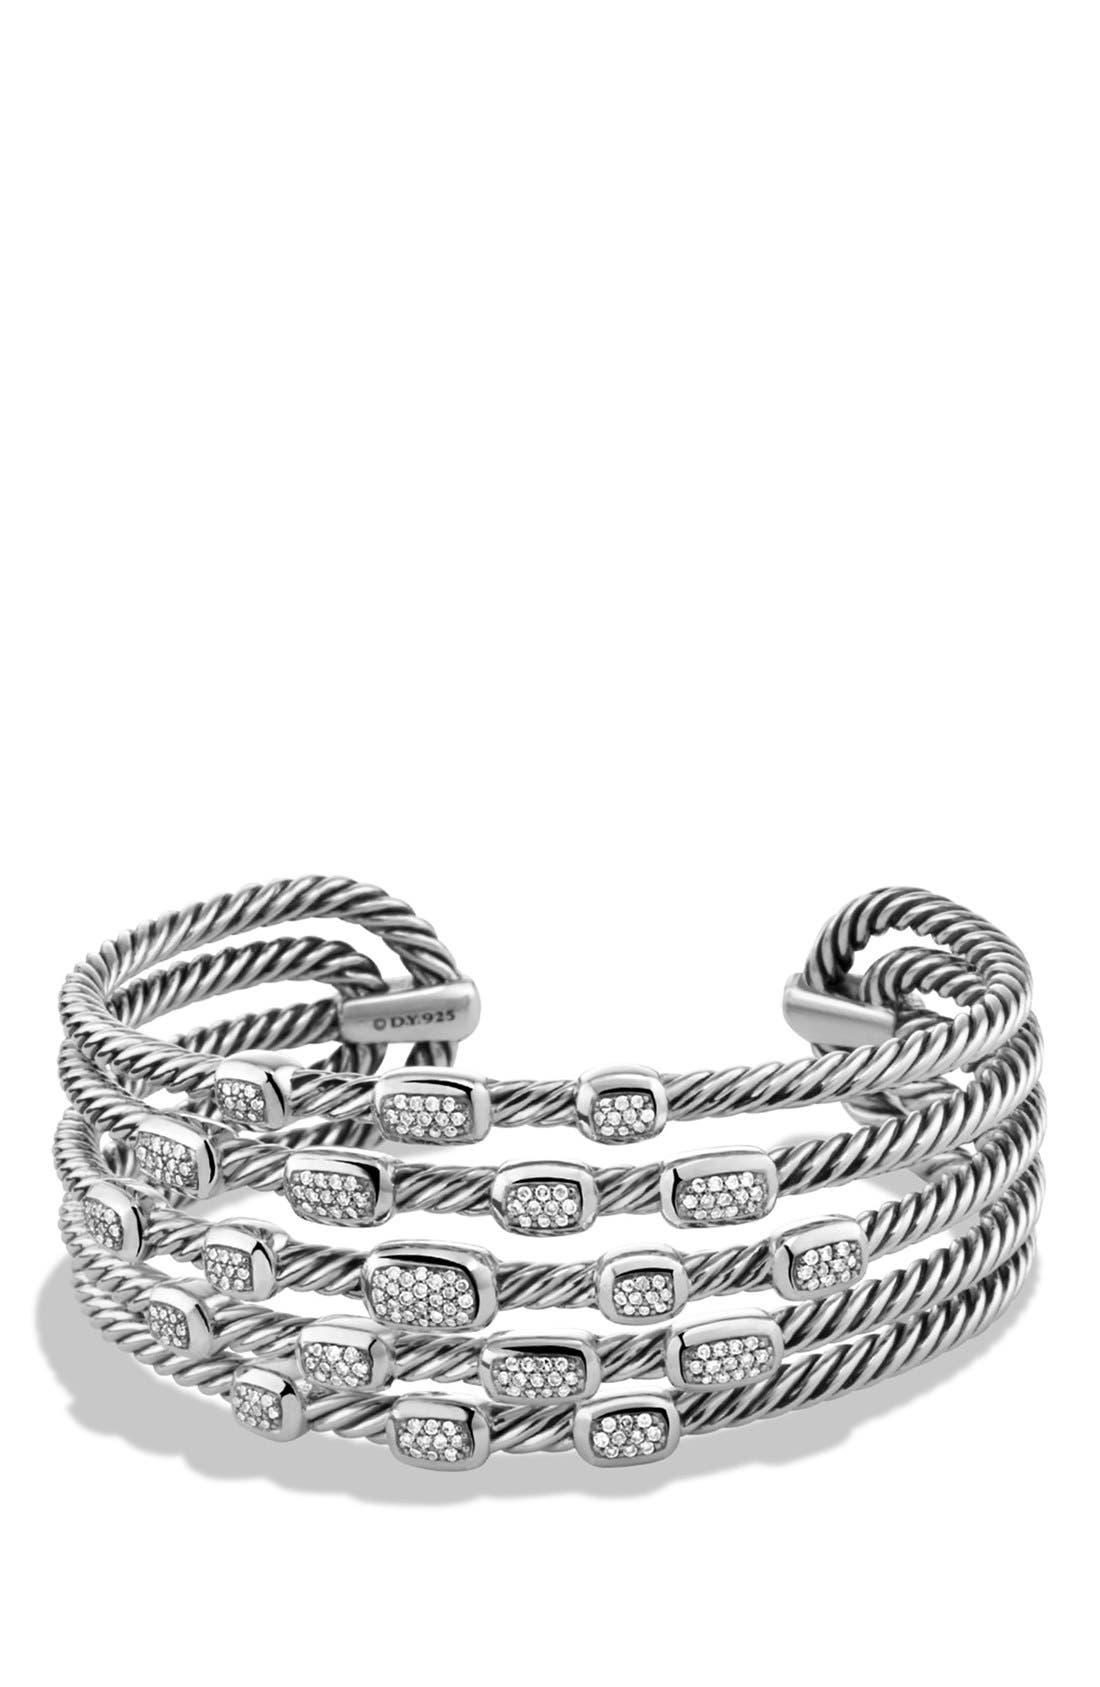 Main Image - David Yurman 'Confetti' Wide Cuff Bracelet with Diamonds